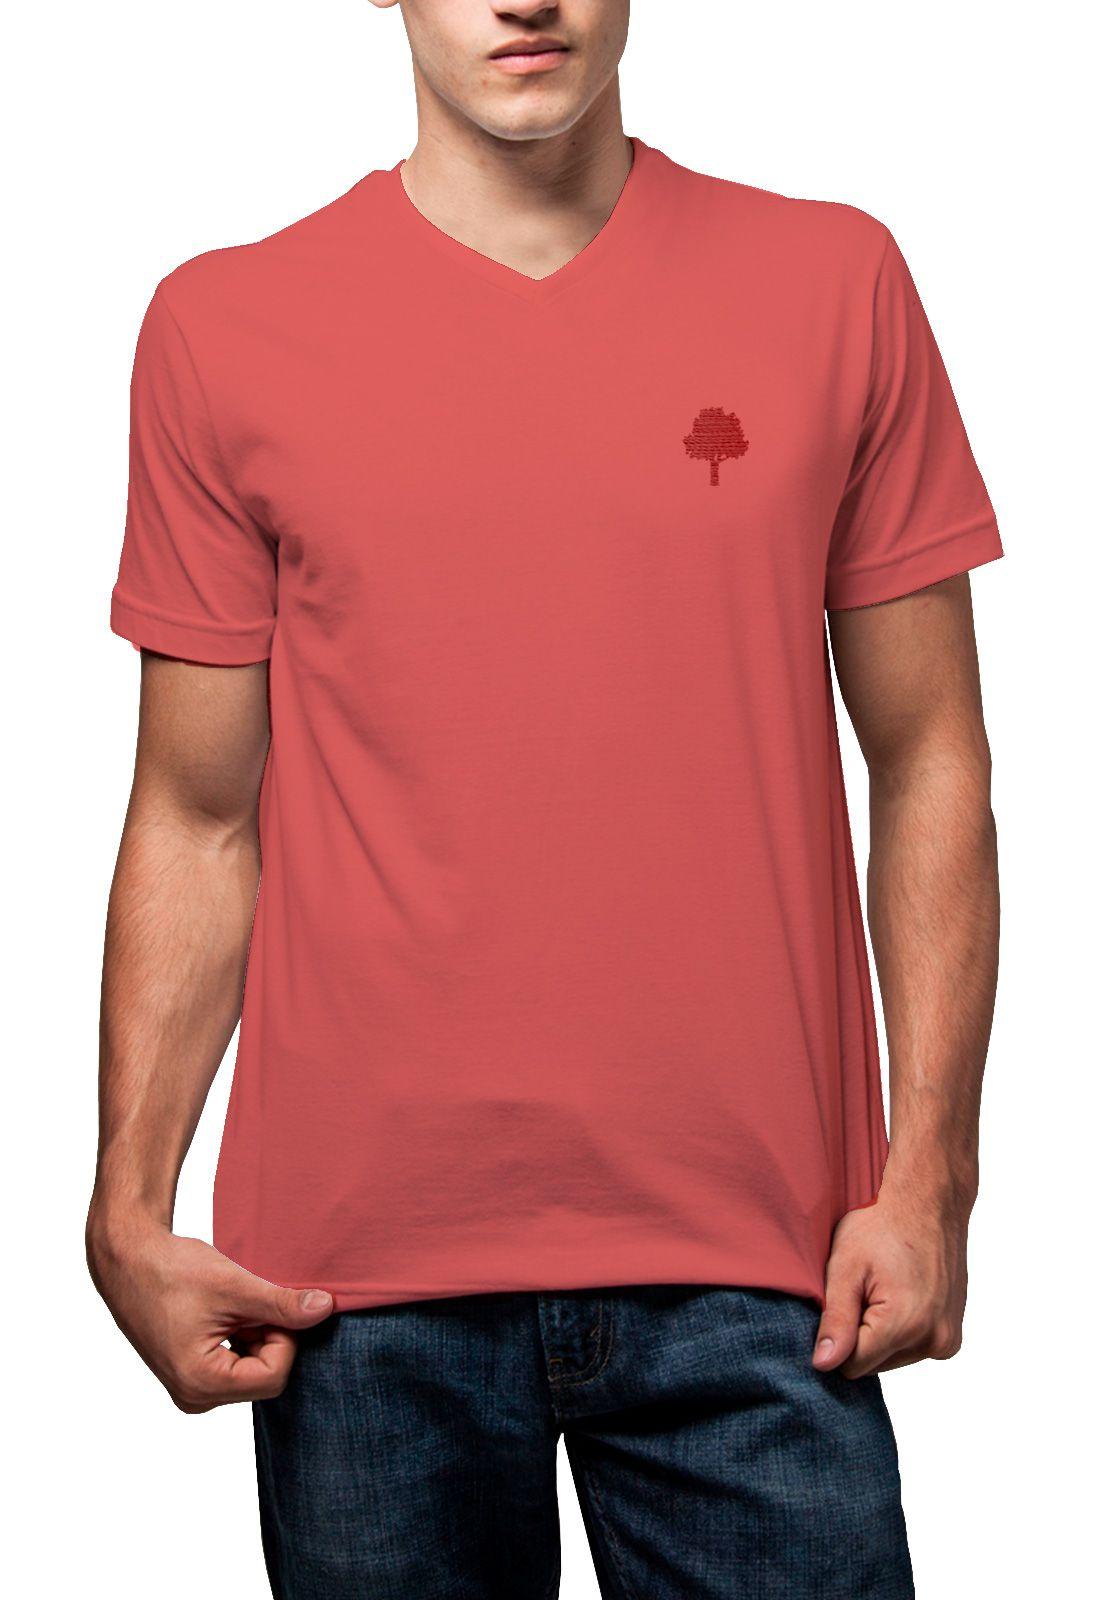 Camiseta Amazônia Básica Árvore Bordada Gola V - Vermelho